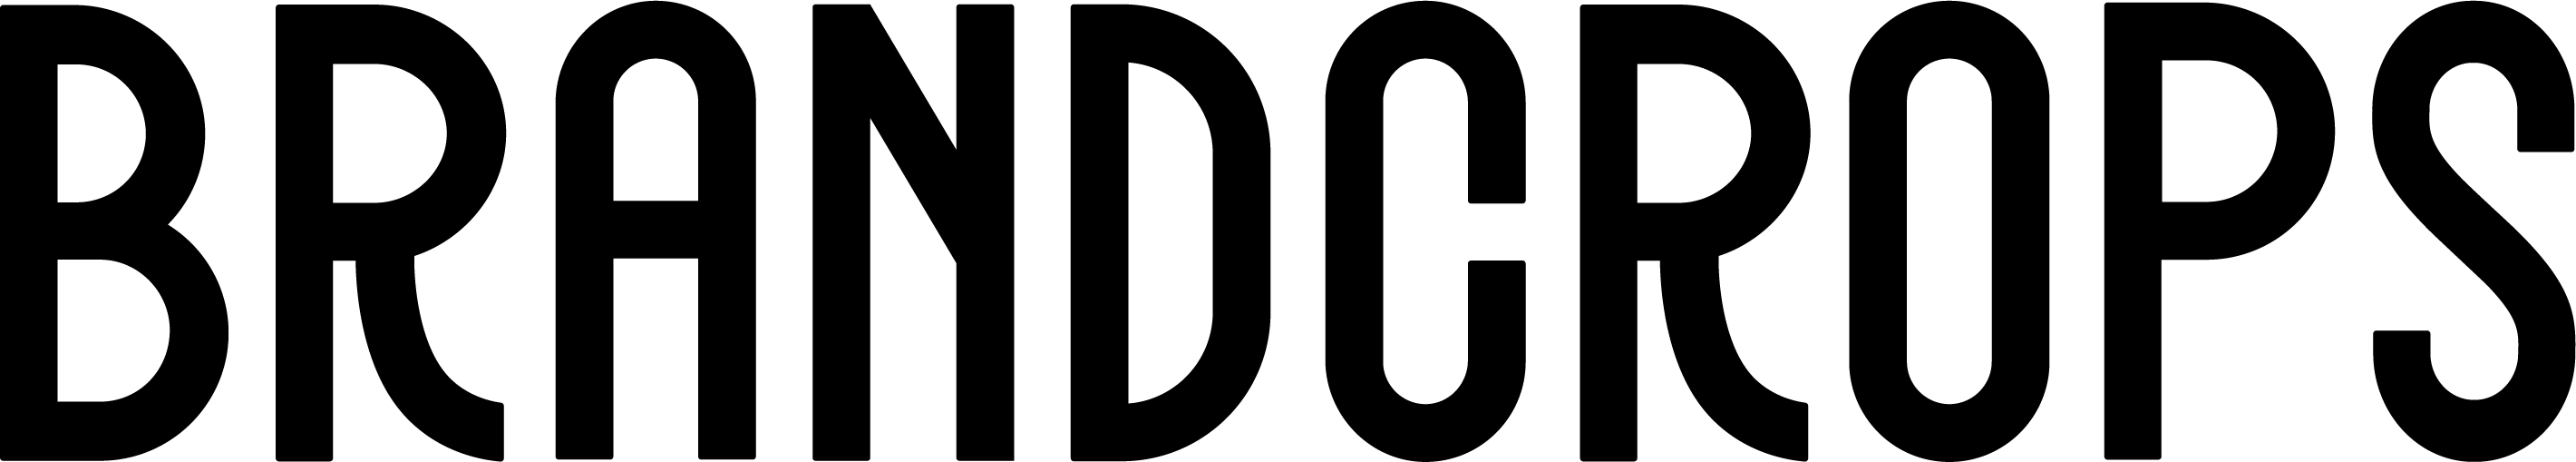 BRANDCROPS